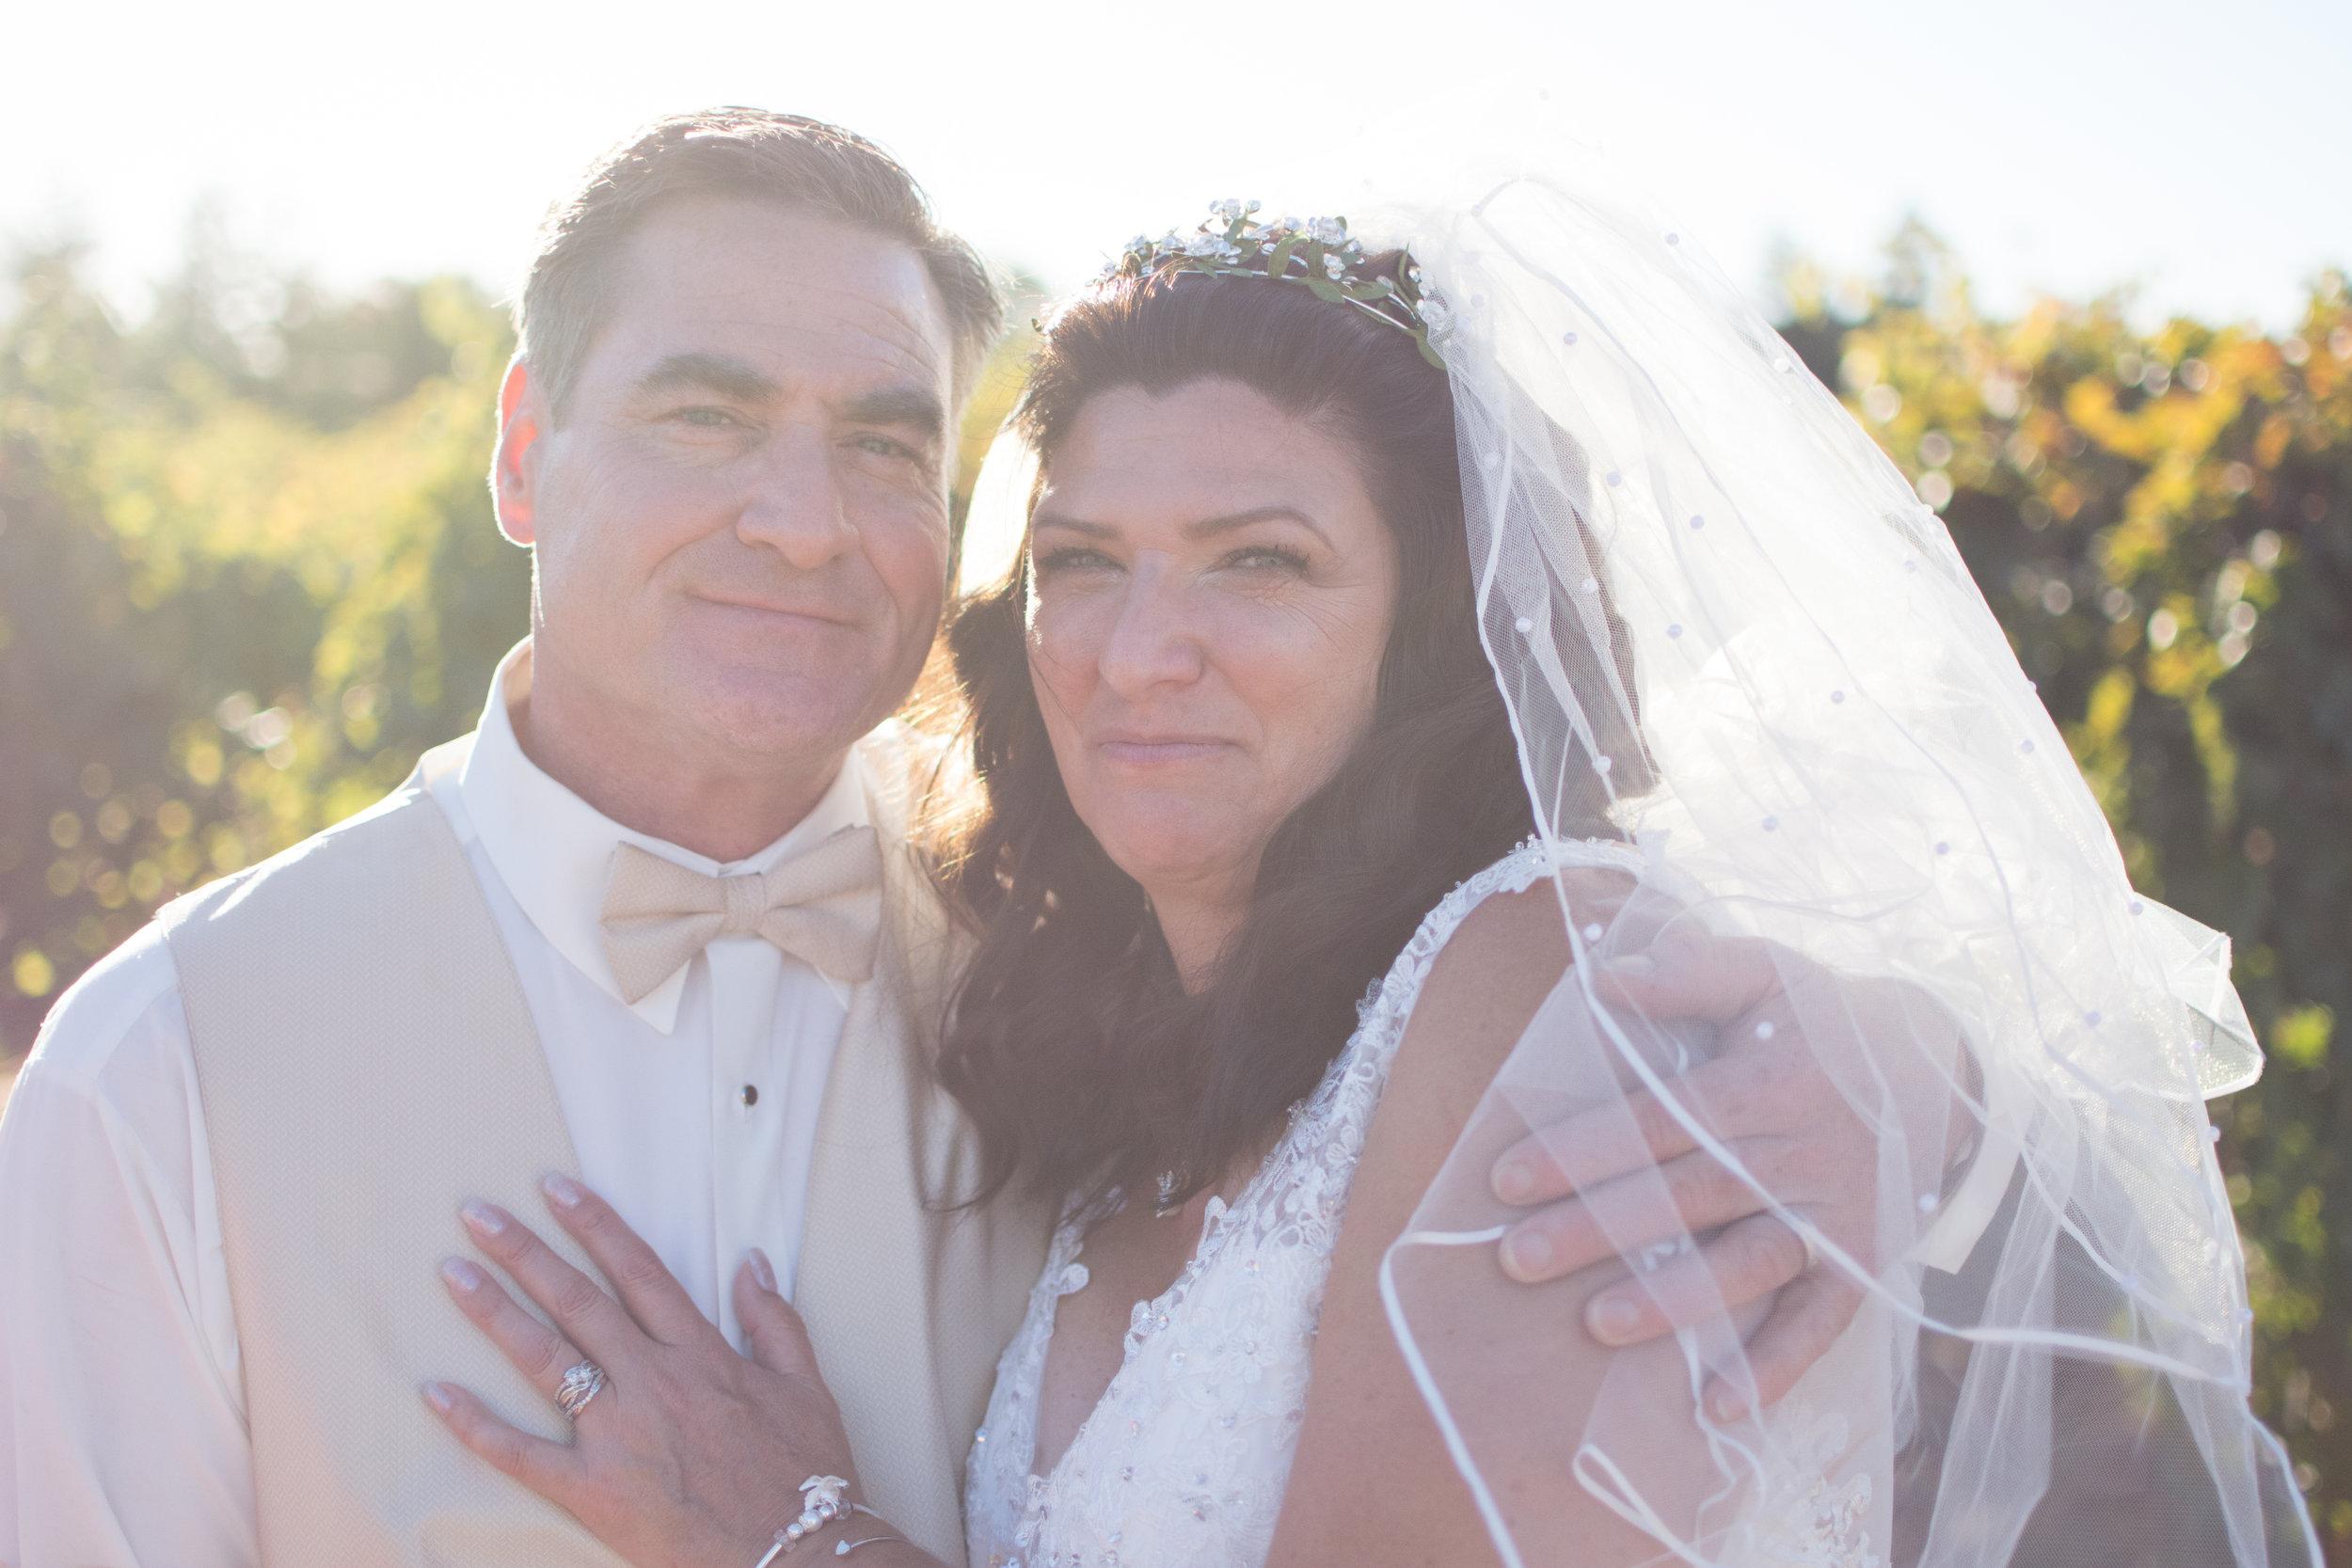 Christine & Allie Wedding Photos  (39 of 41).jpg